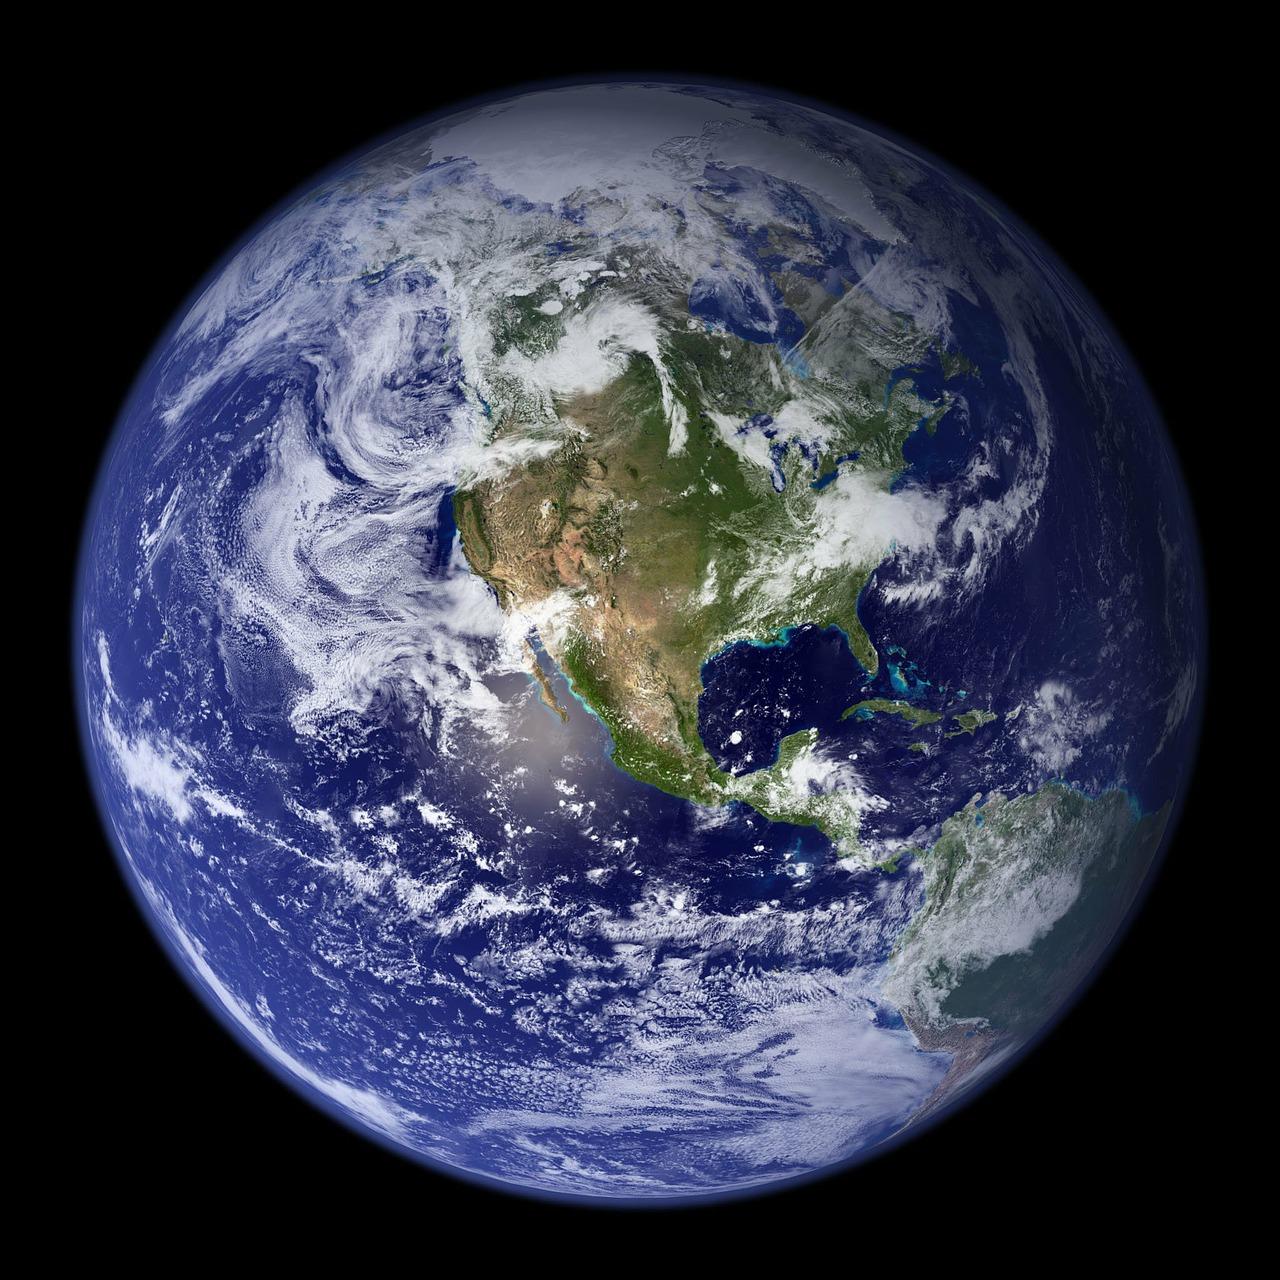 【書籍紹介】「地球46億年 気候大変動」 炭素循環で読み解く、地球気候の過去・現在・未来  横山 祐典 (著)